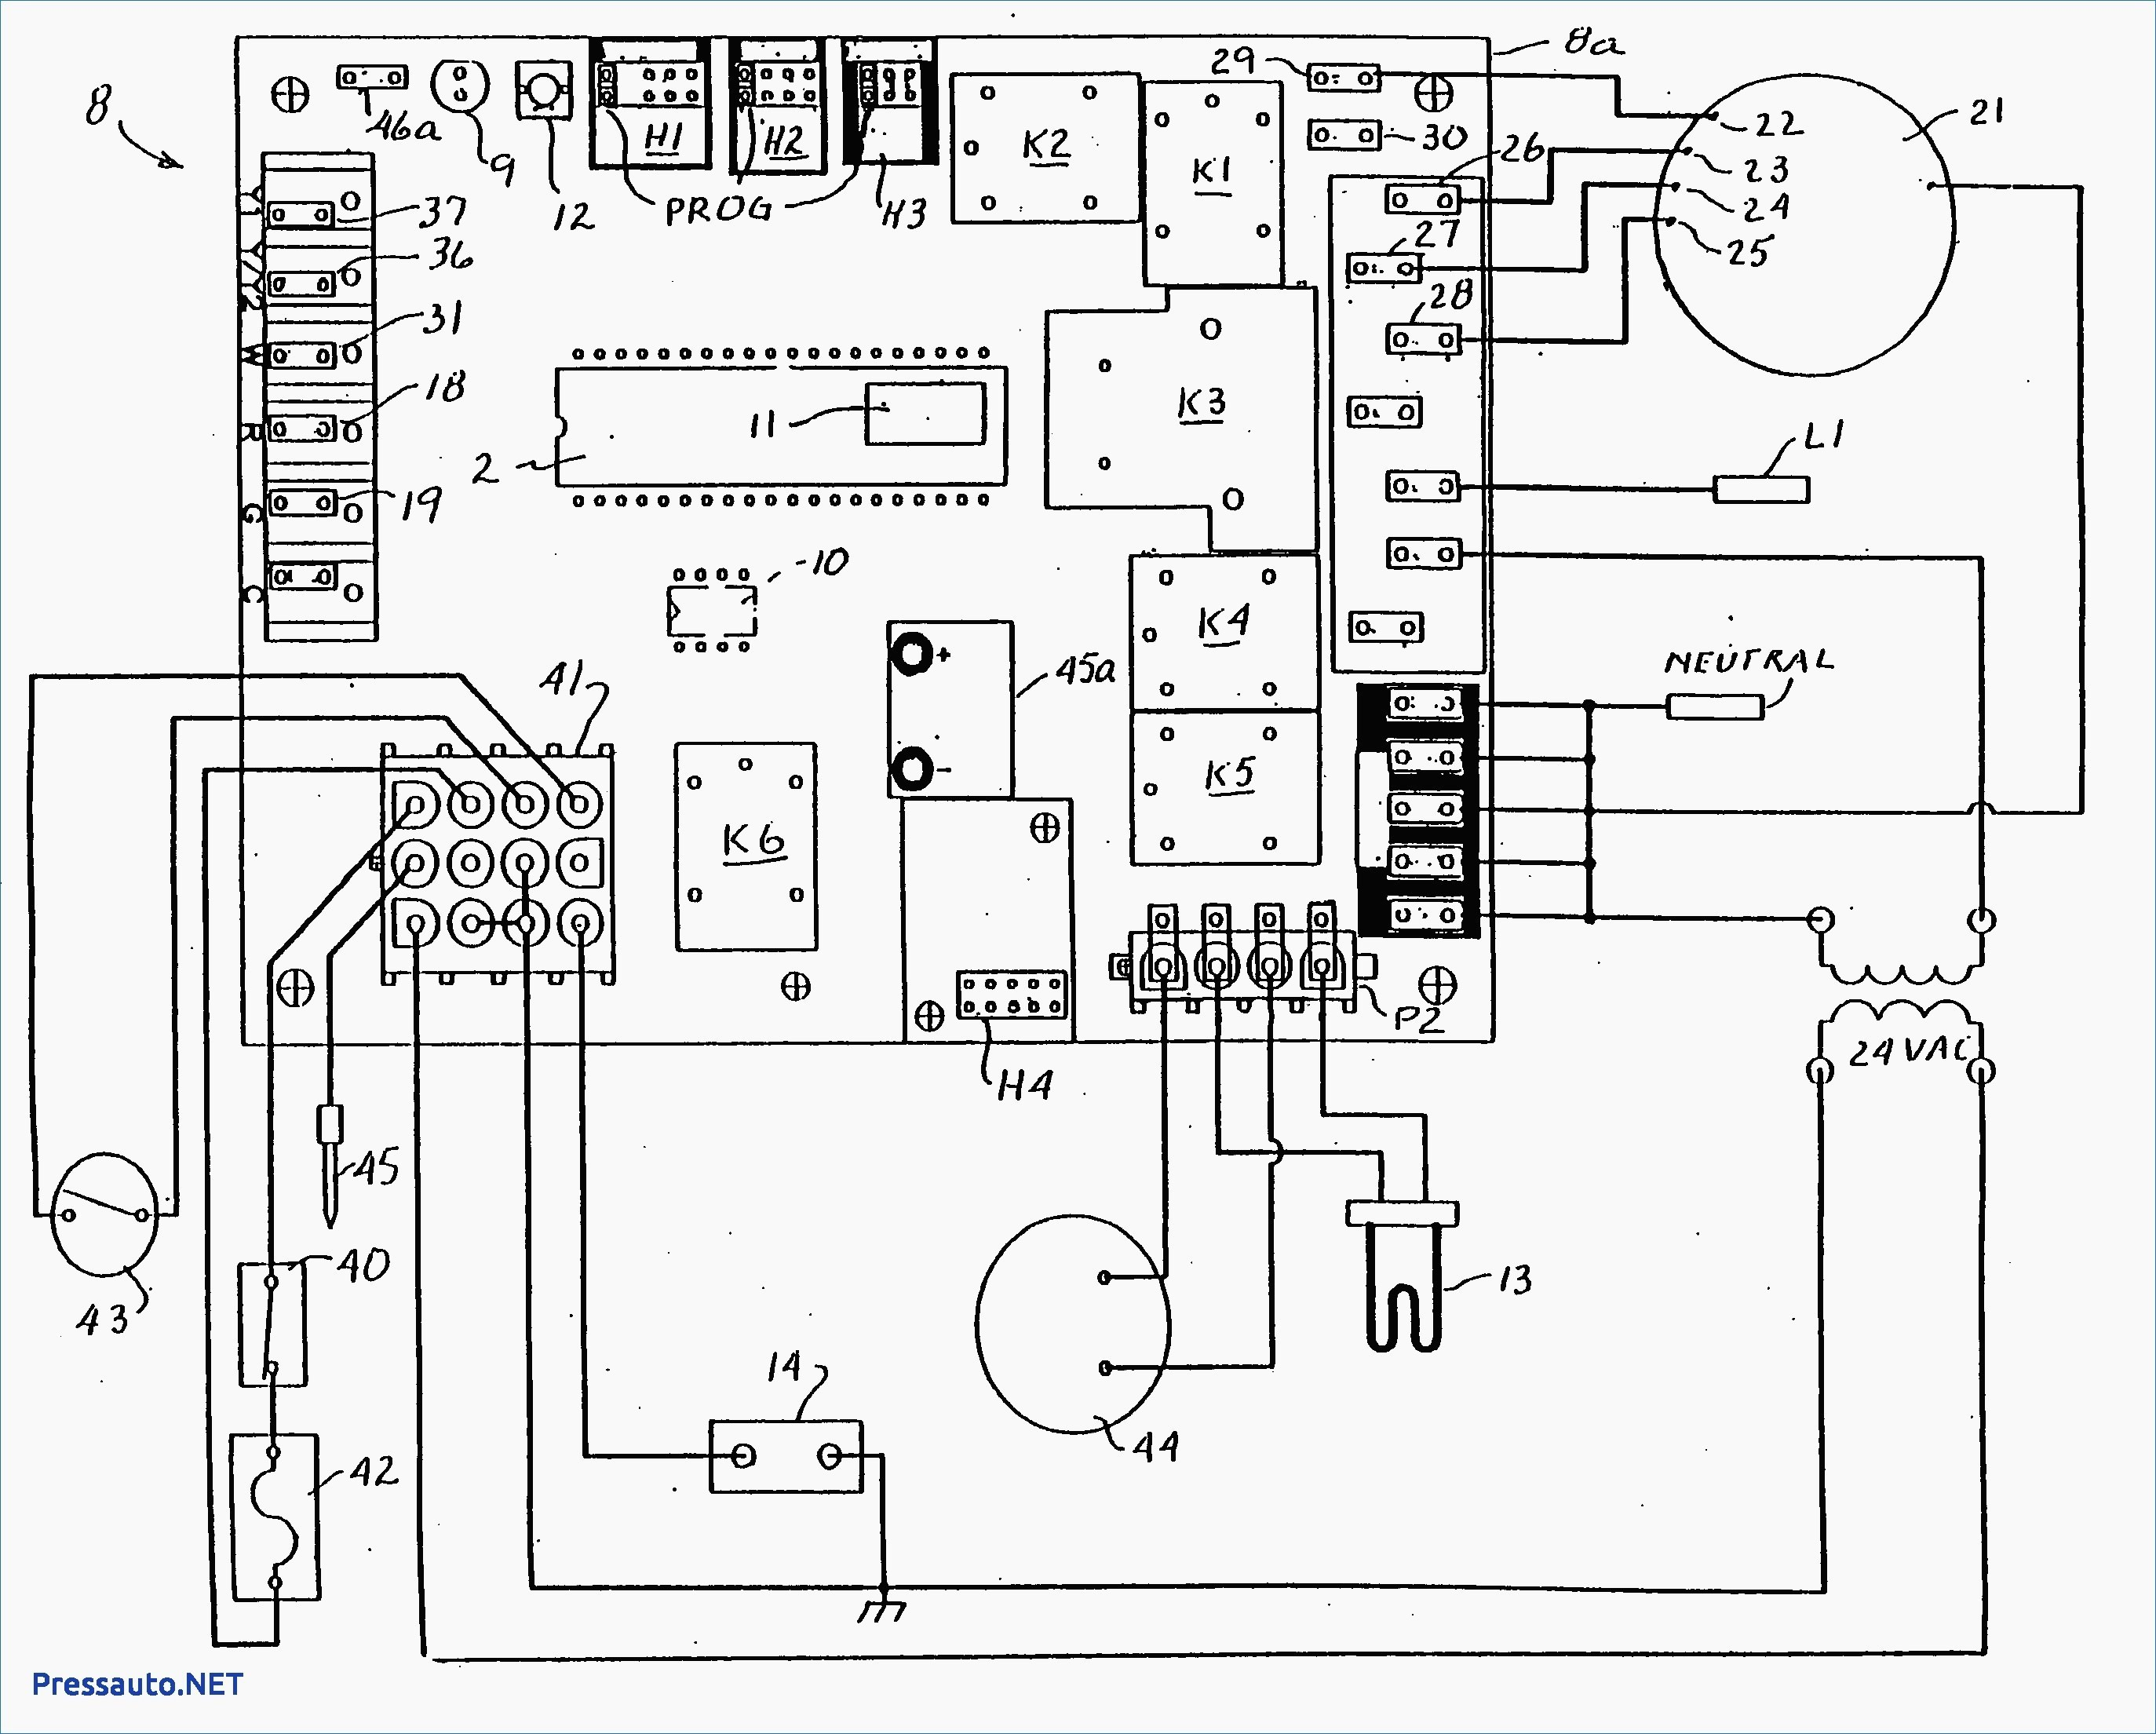 KW_4911] York Stellar Furnace Wiring Diagram Schematic WiringSeme Semec Viewor Mohammedshrine Librar Wiring 101